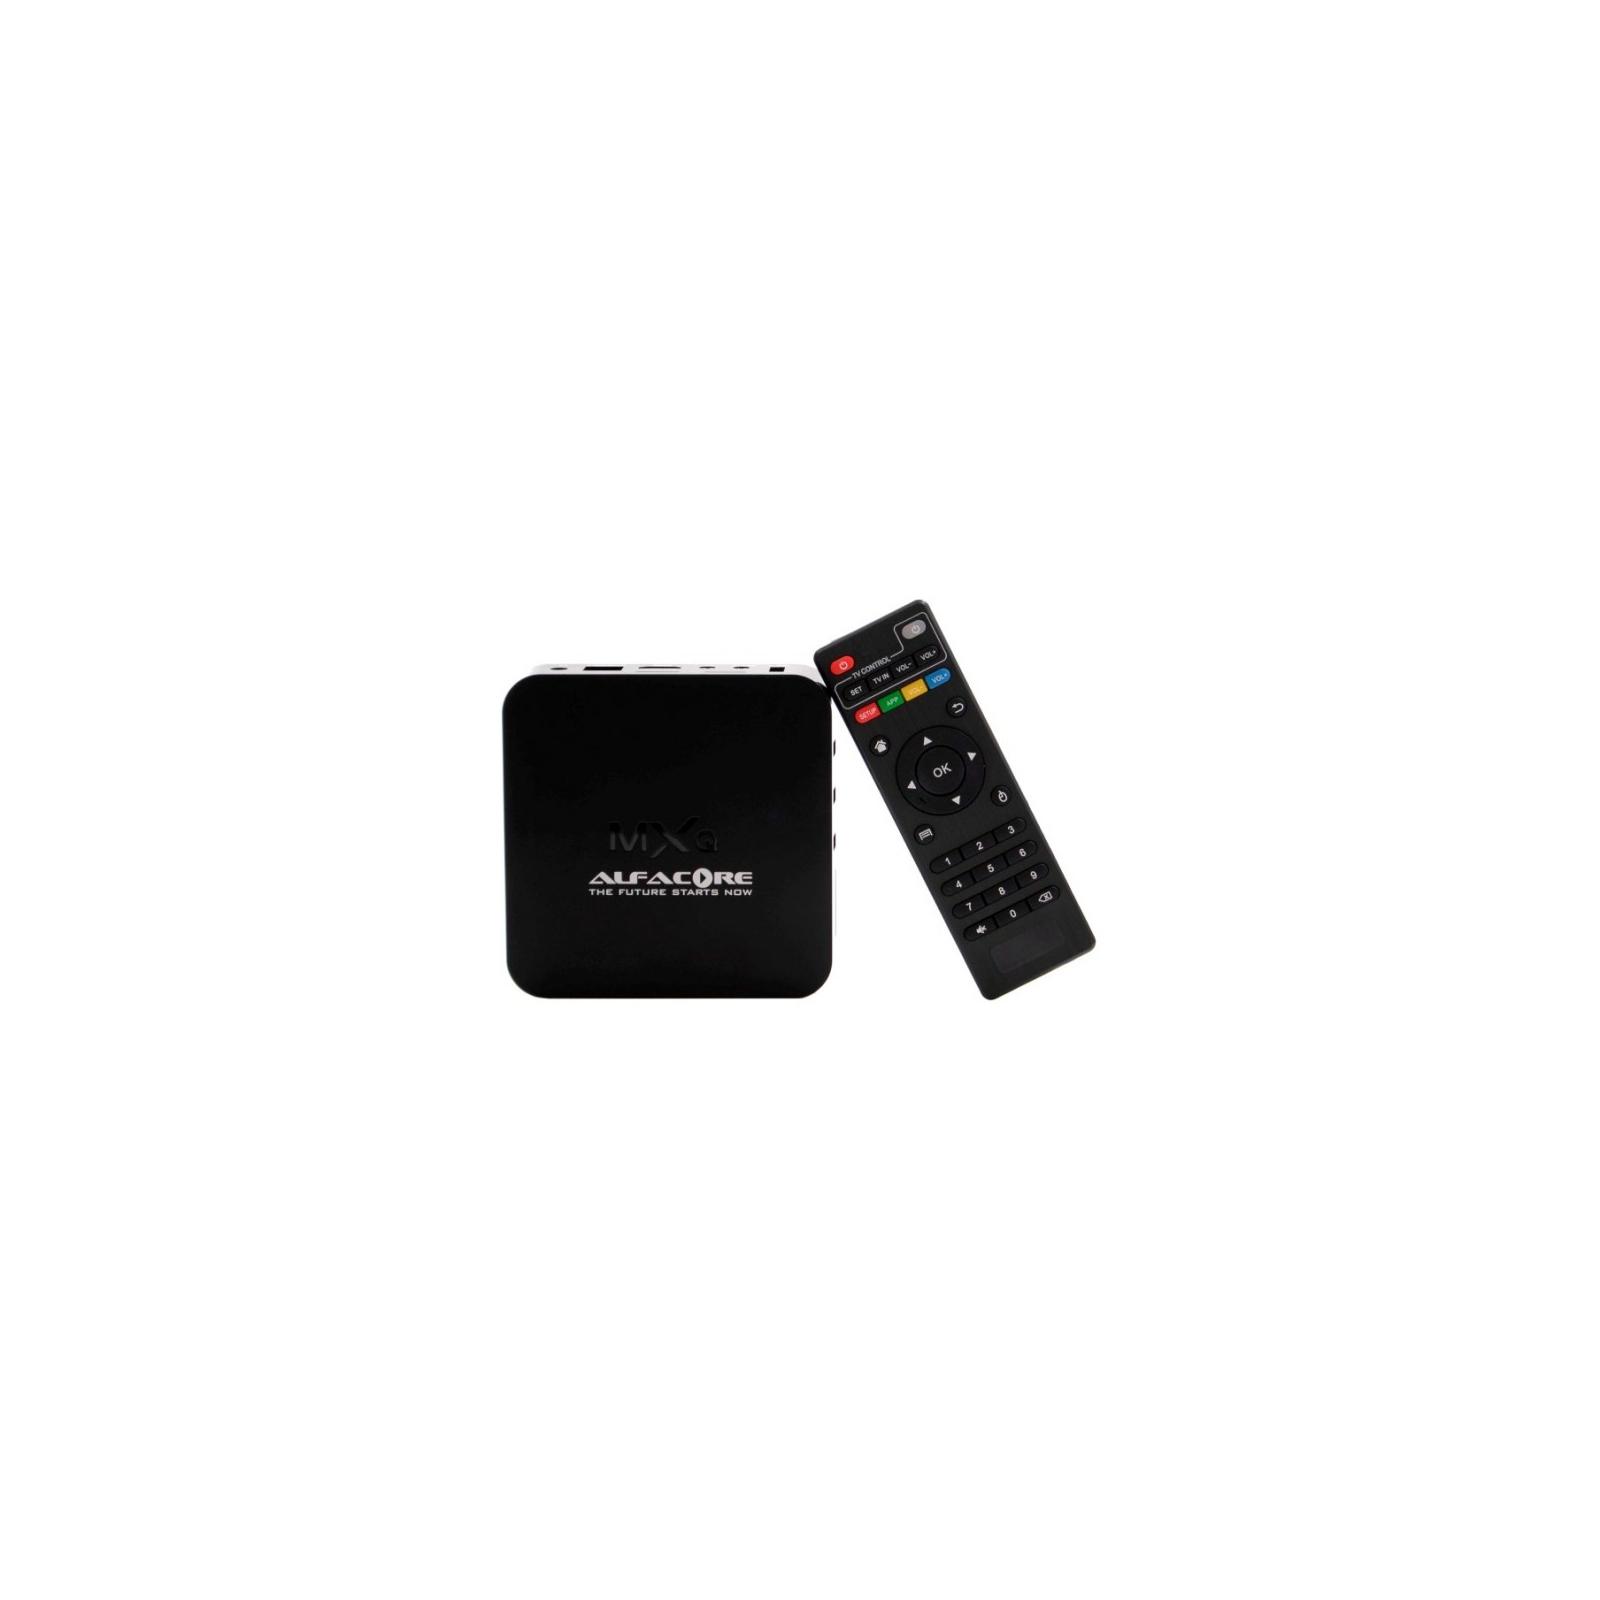 Медиаплеер Alfacore Smart TV MXQ изображение 7